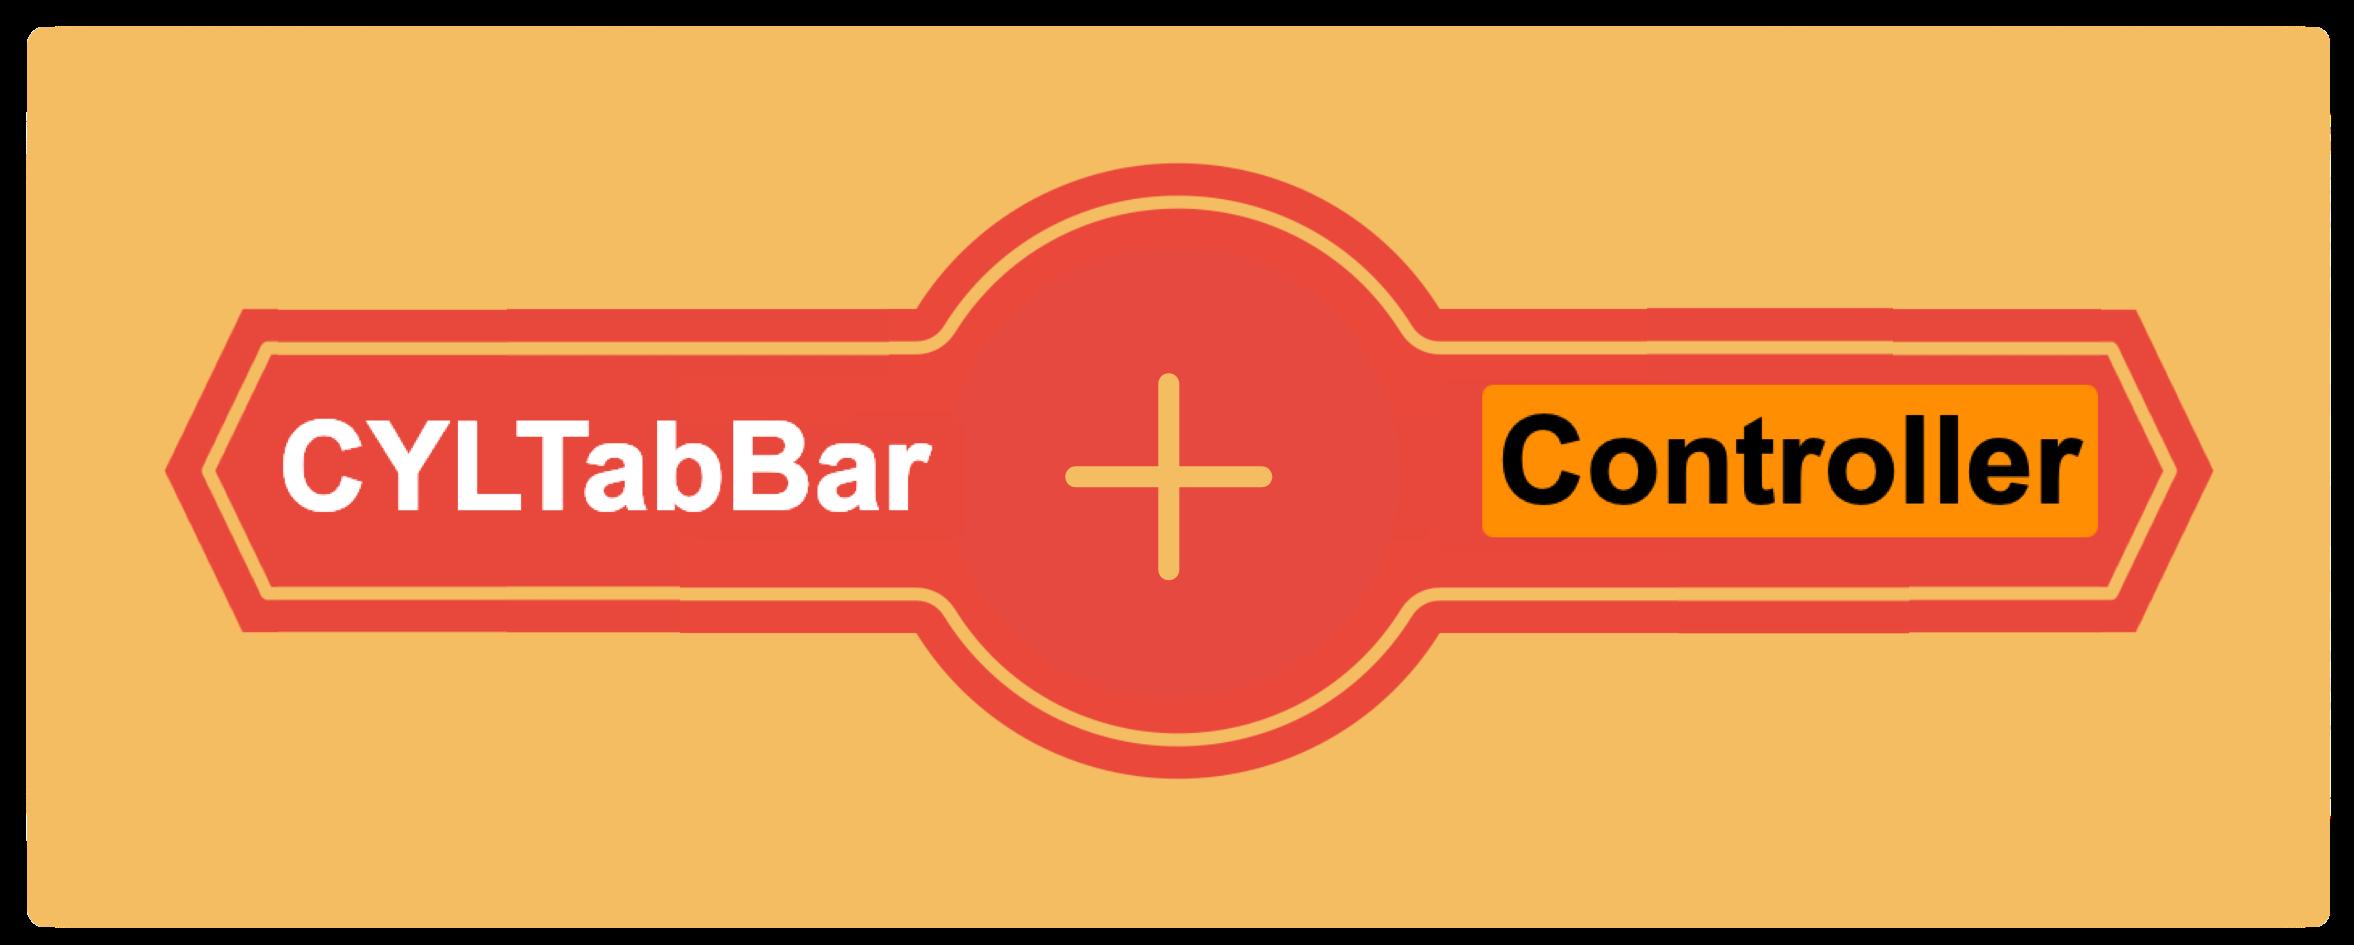 CYLTabBarController